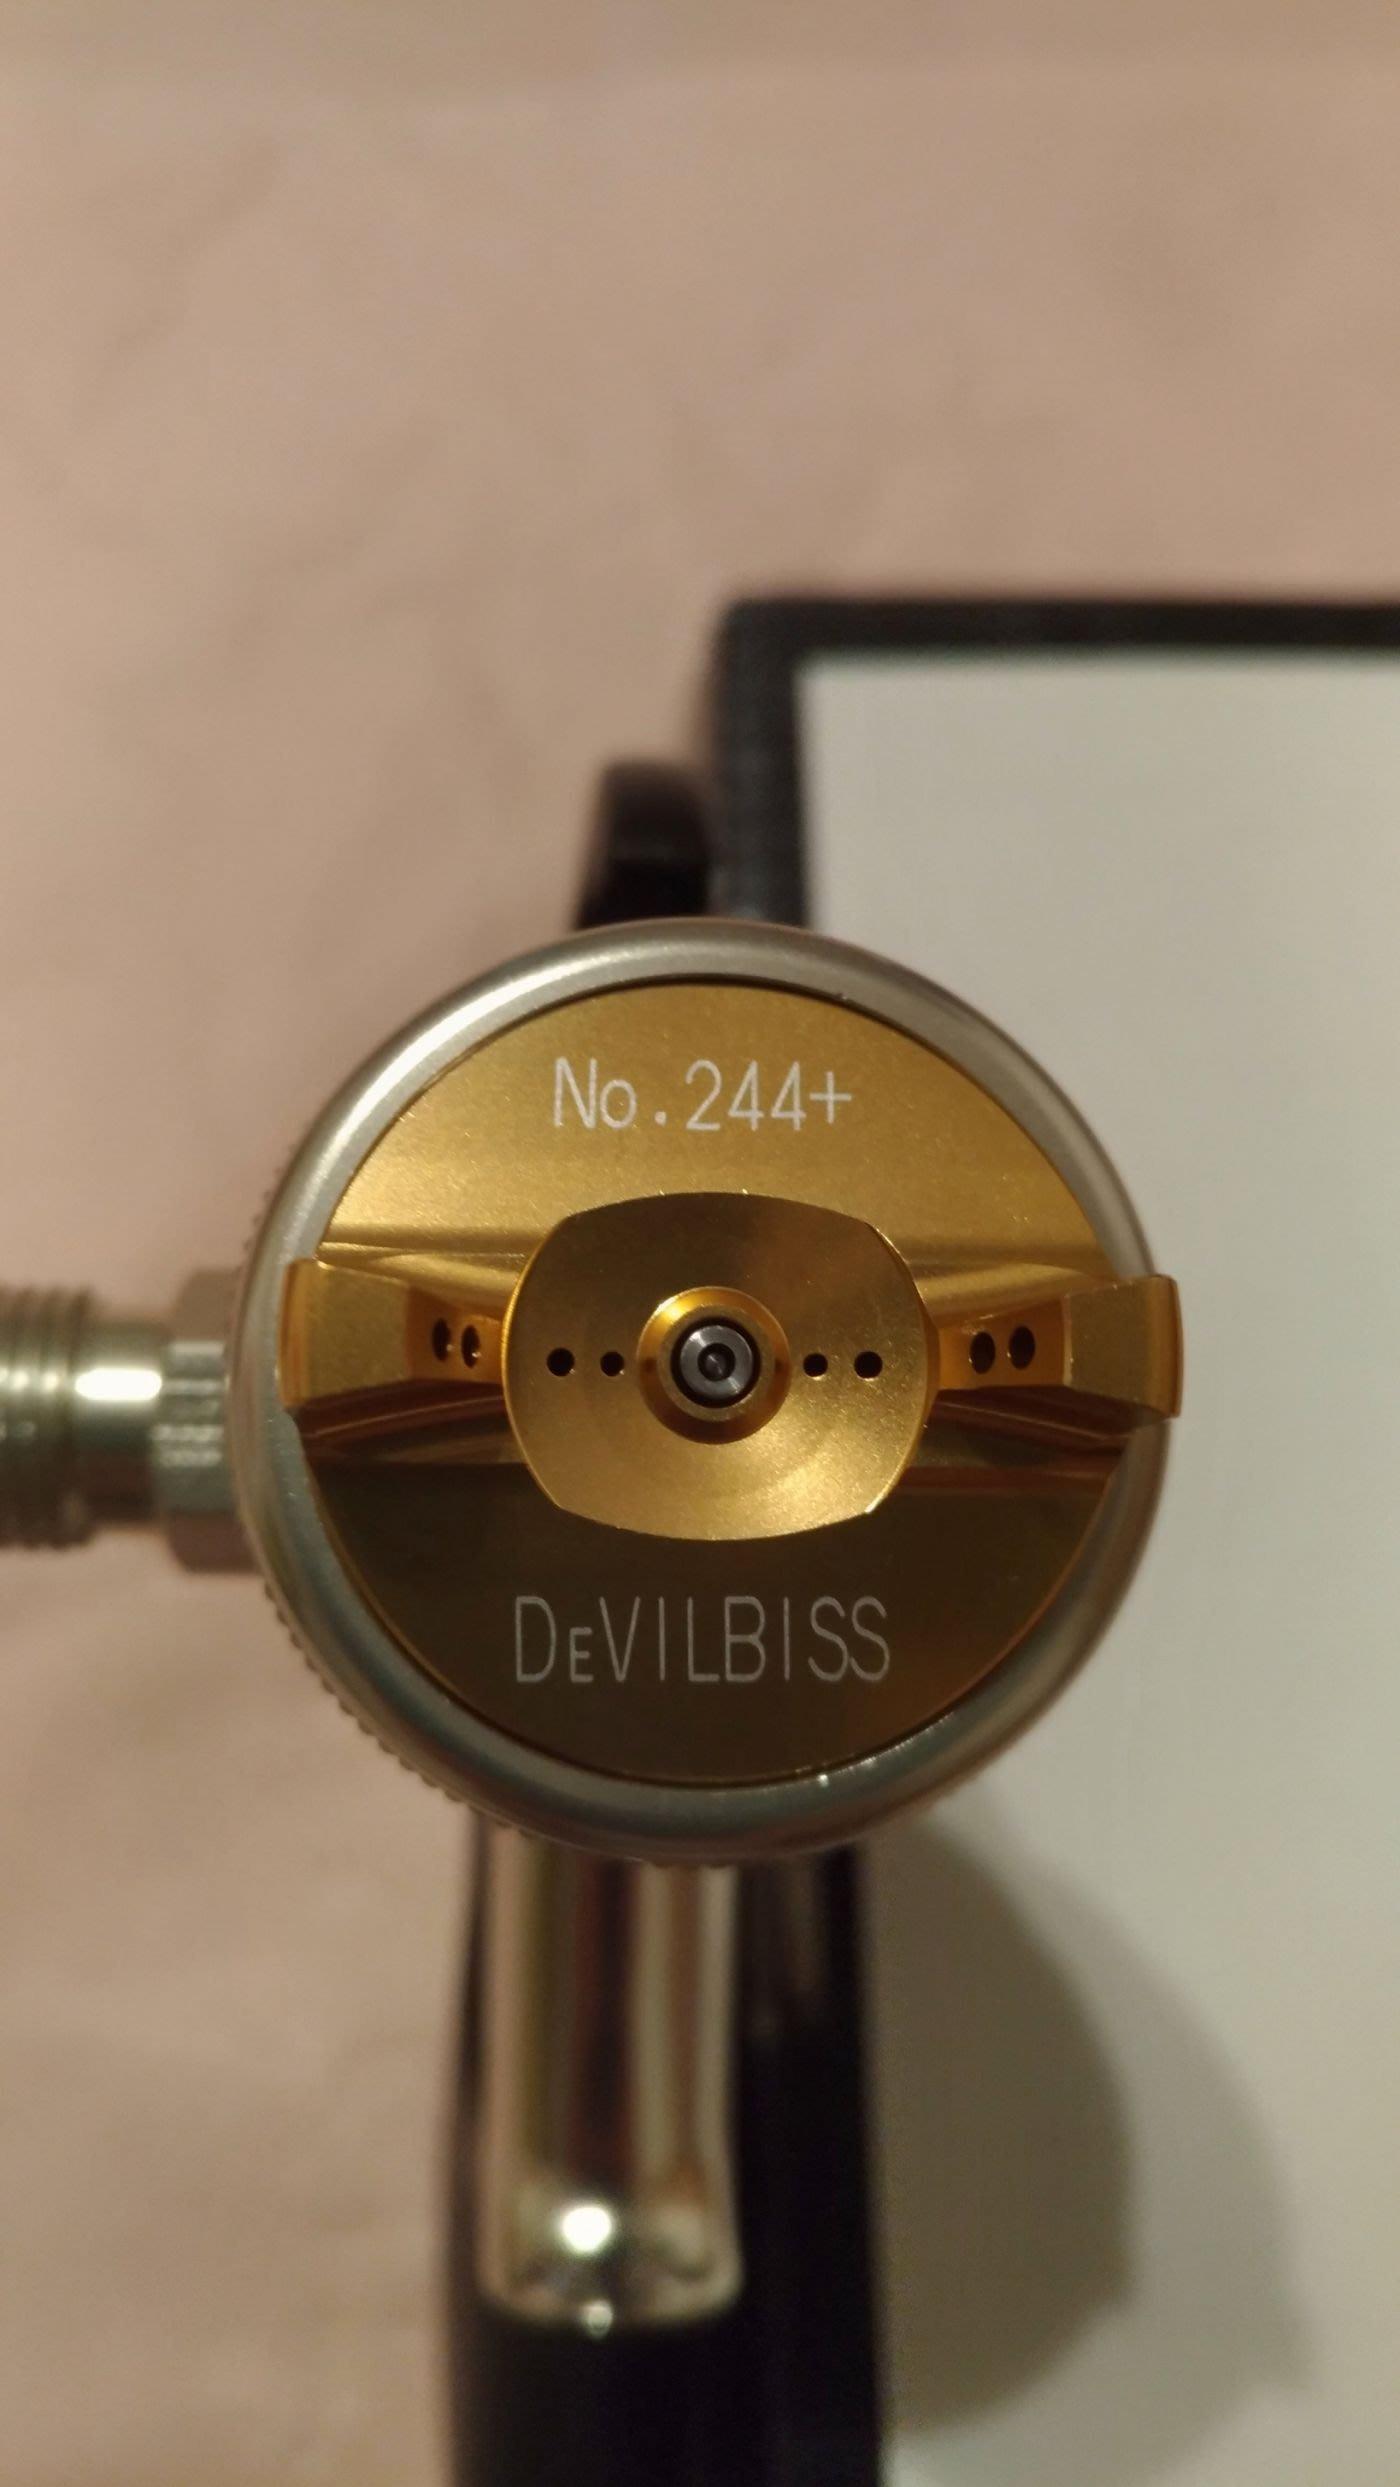 Devilbiss Luna-244鎂合金   日本製噴槍